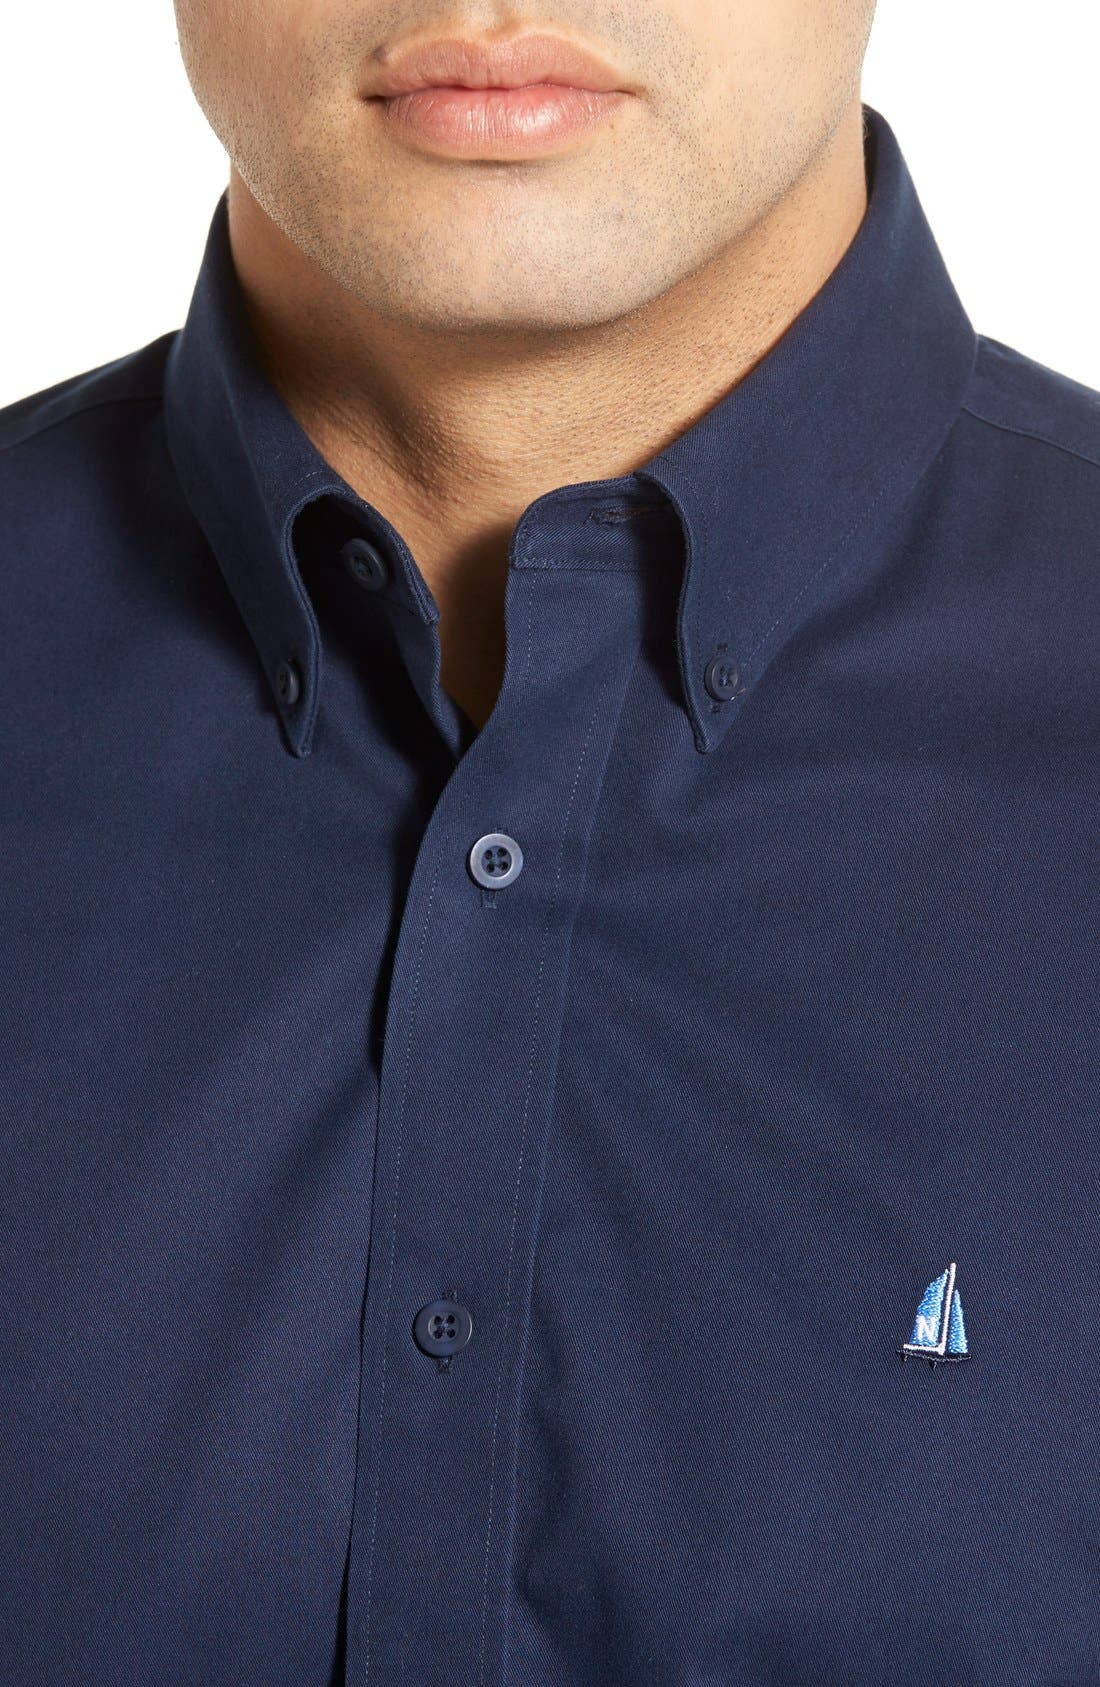 Alternate Image 4  - Nordstrom Men's Shop Smartcare™ Traditional Fit Twill Boat Shirt (Regular & Tall)